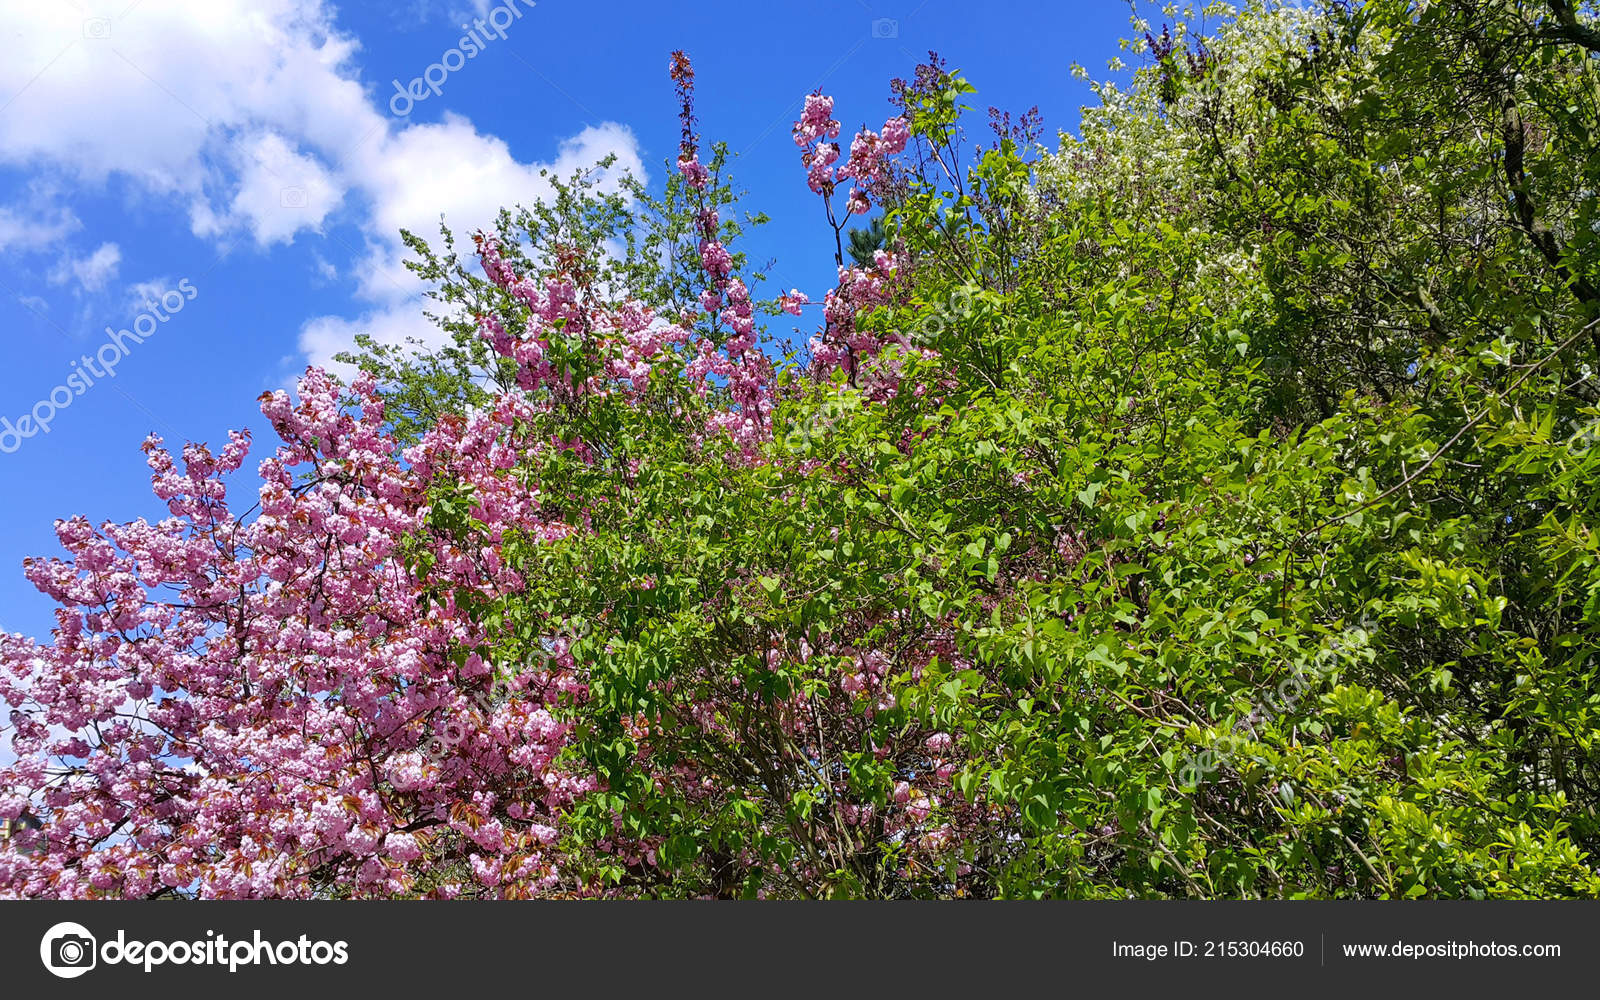 Beautiful Pink Flowers Fresh Green Leaves Spring Trees Blue Sky